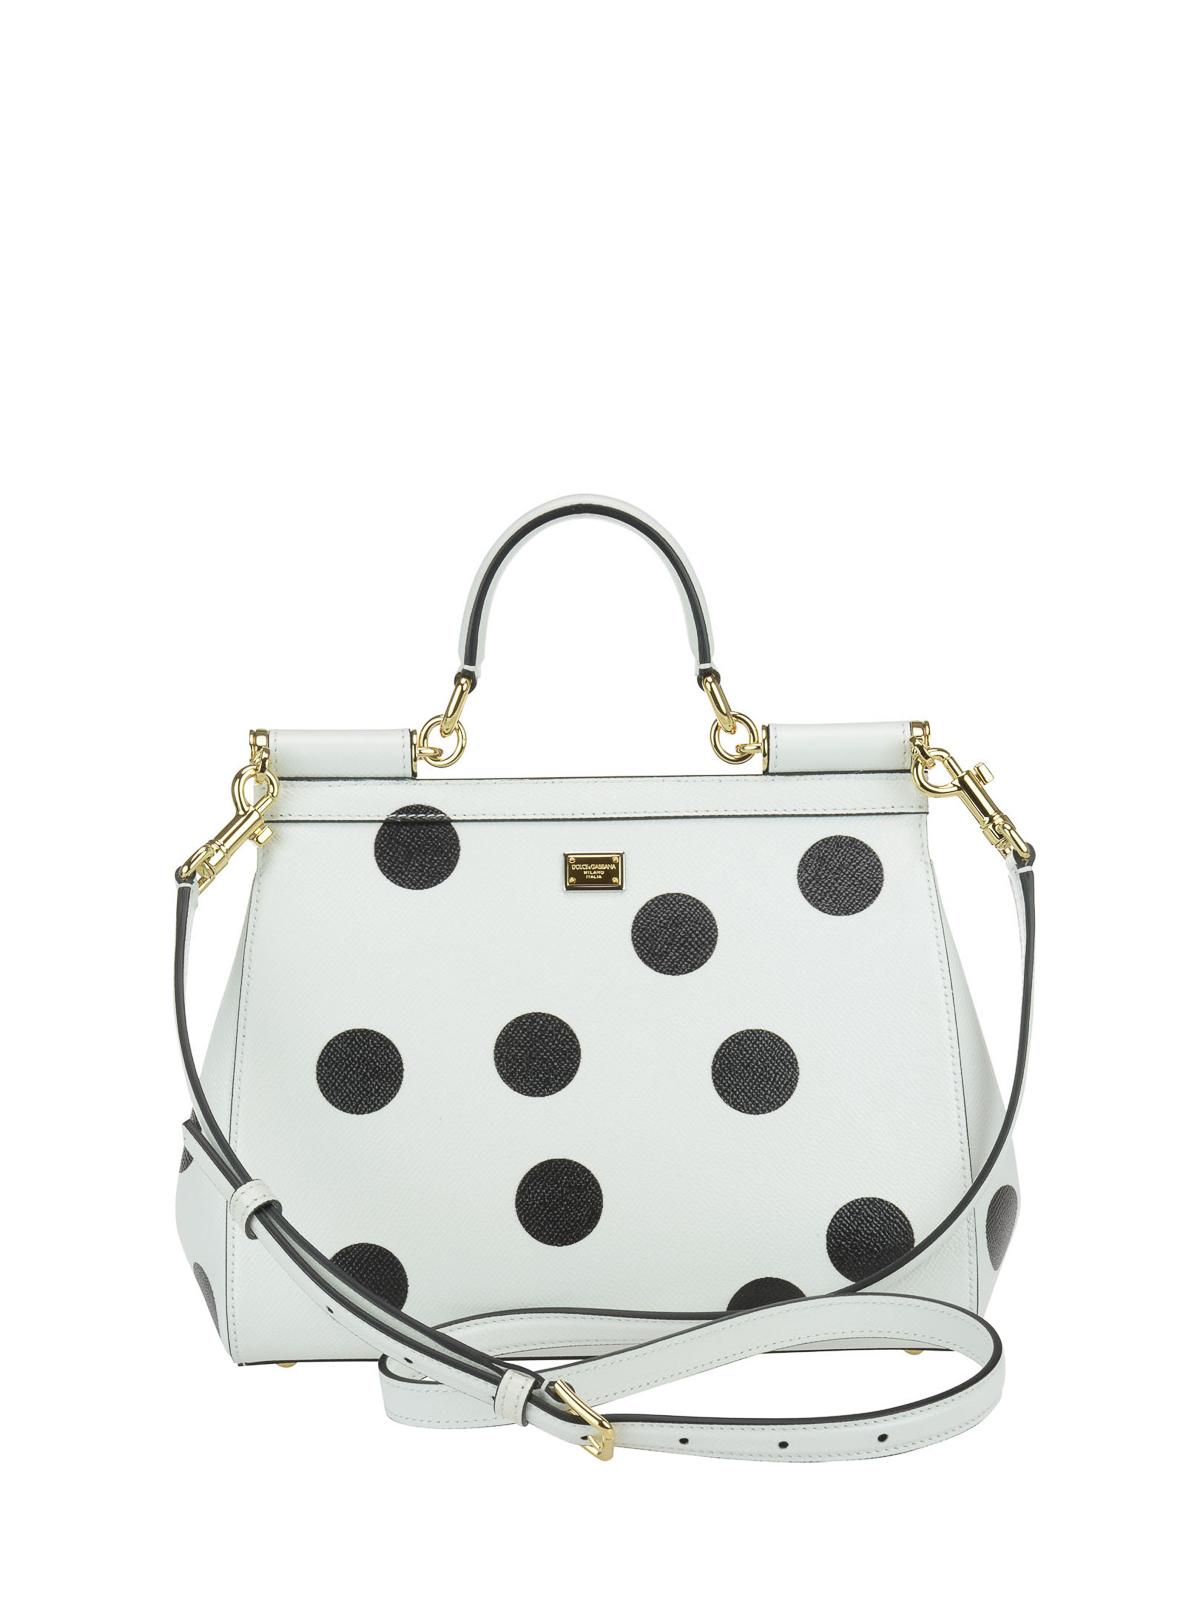 iKRIX DOLCE   GABBANA  totes bags - Floral polka dot Sicily Medium bag 0d859692c4901